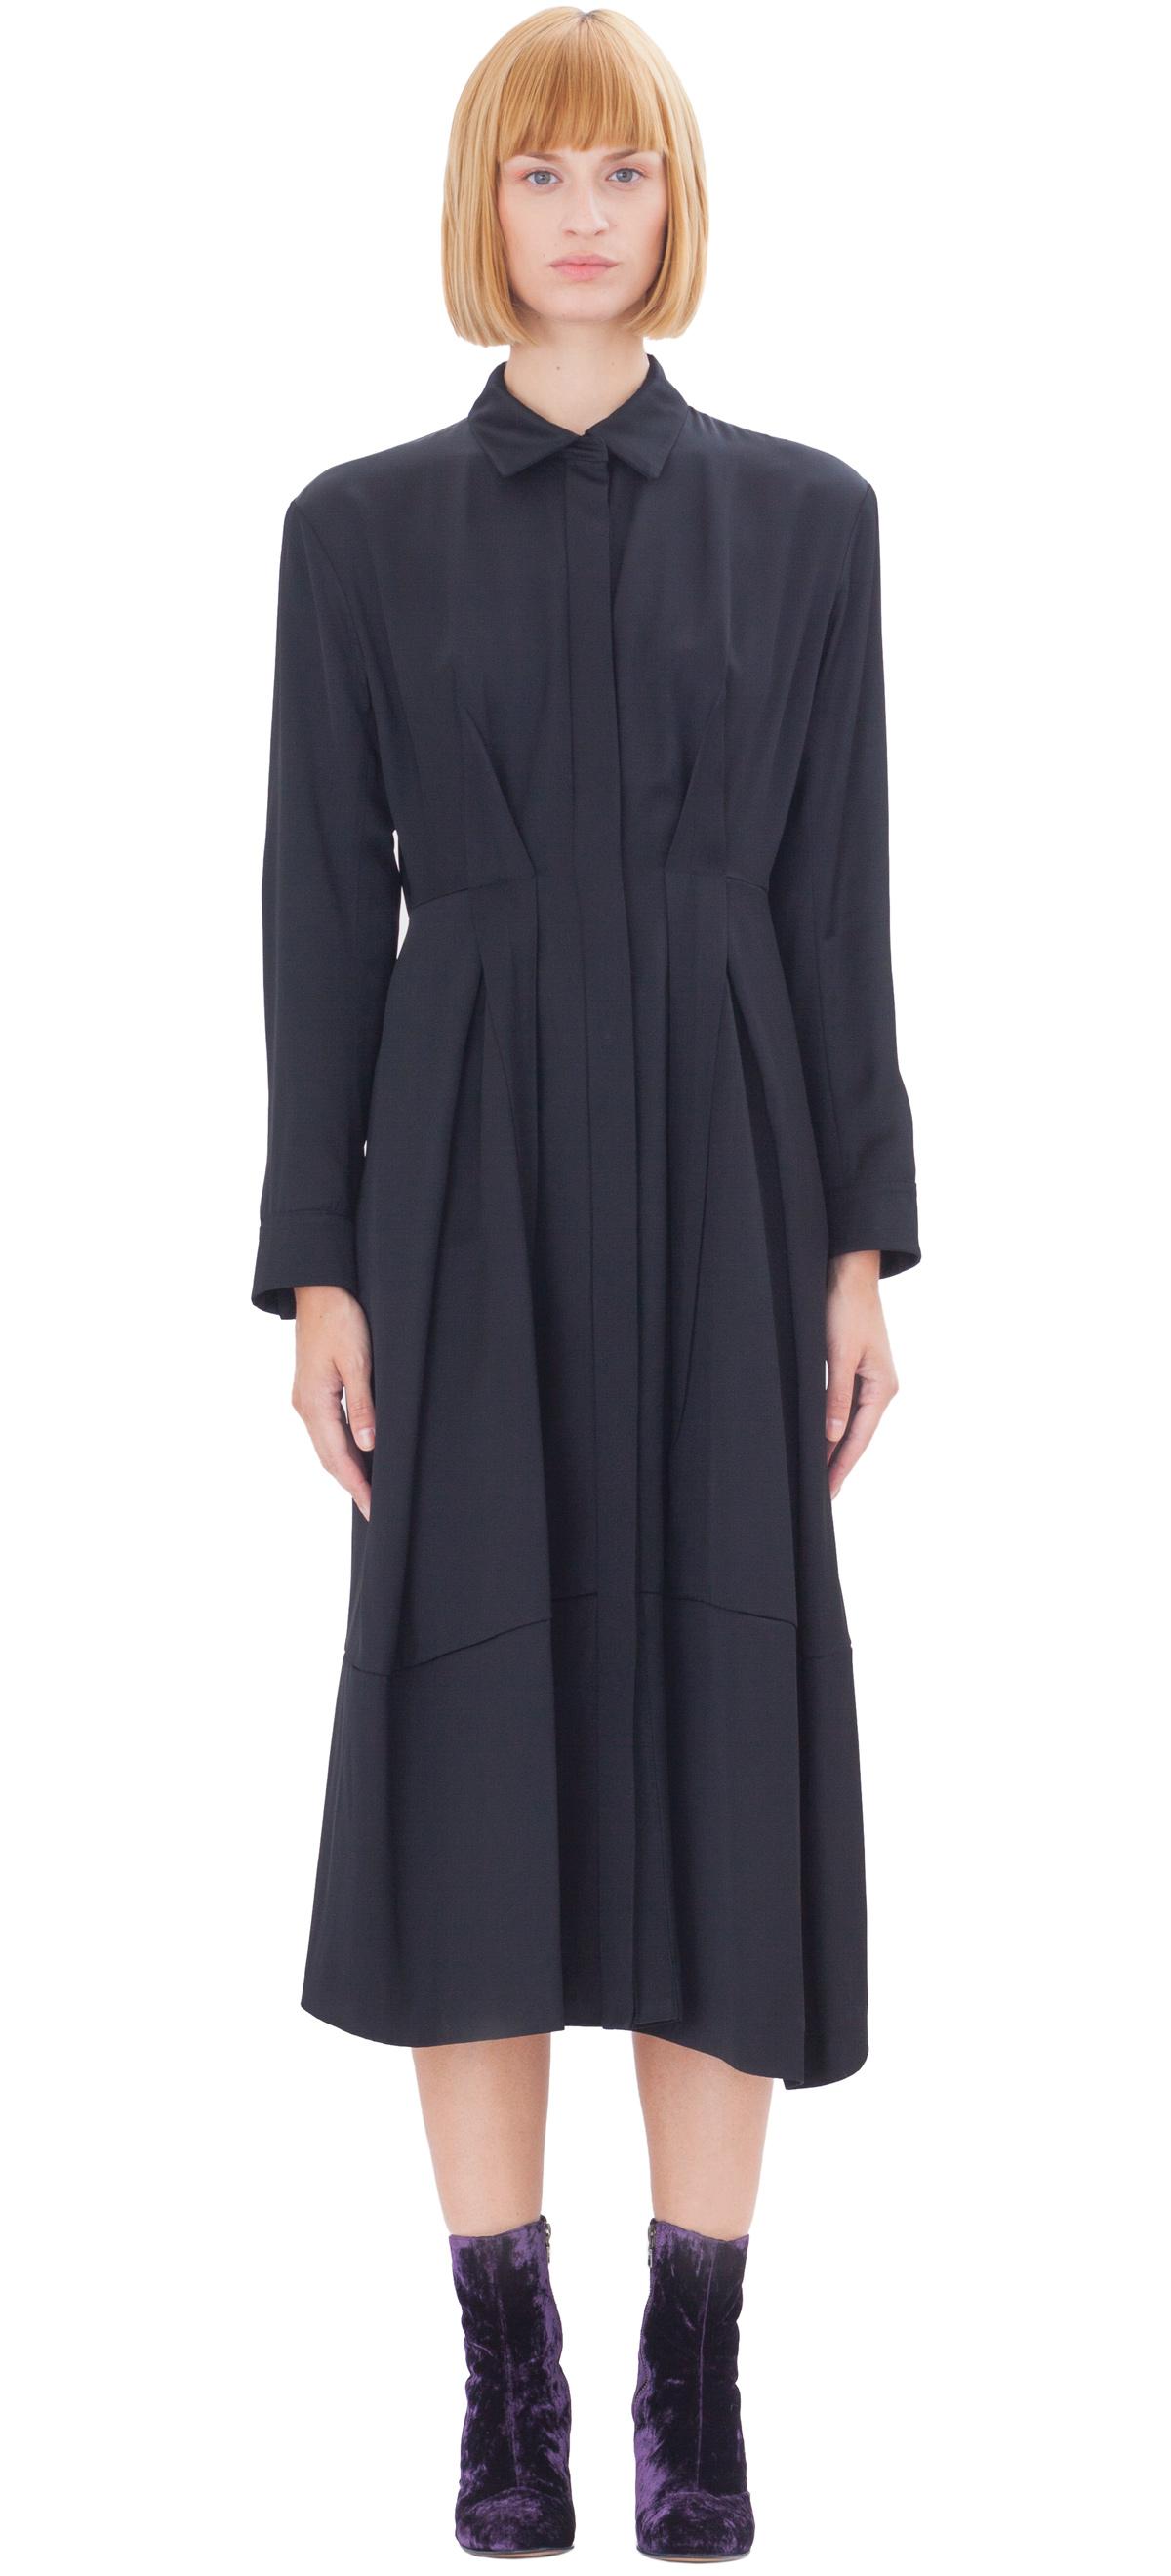 Jil sander Baobab Silk Dress in Black